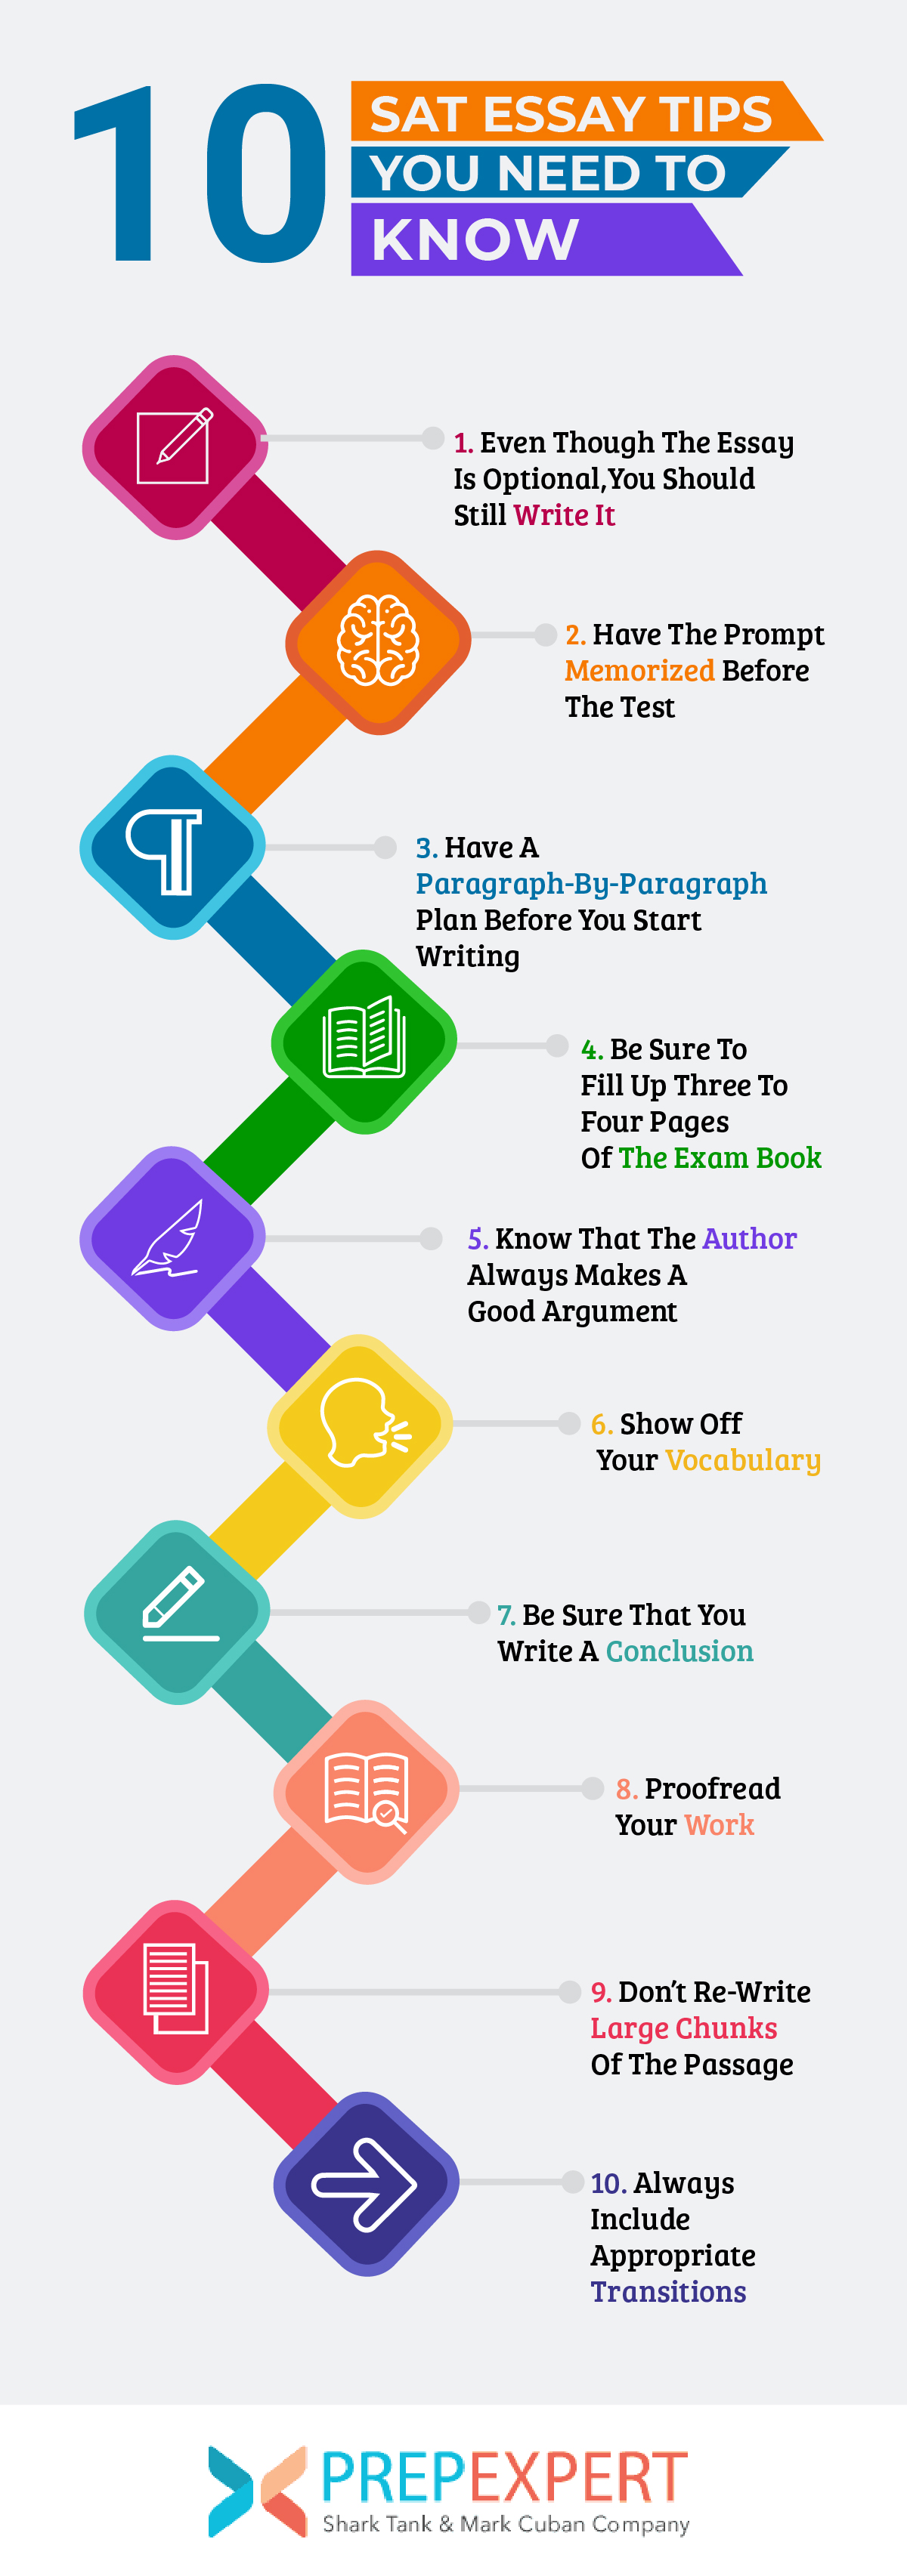 001 239645 Essaytips 060618 Sat Essay Tips Singular Pdf Writing Prepscholar Full